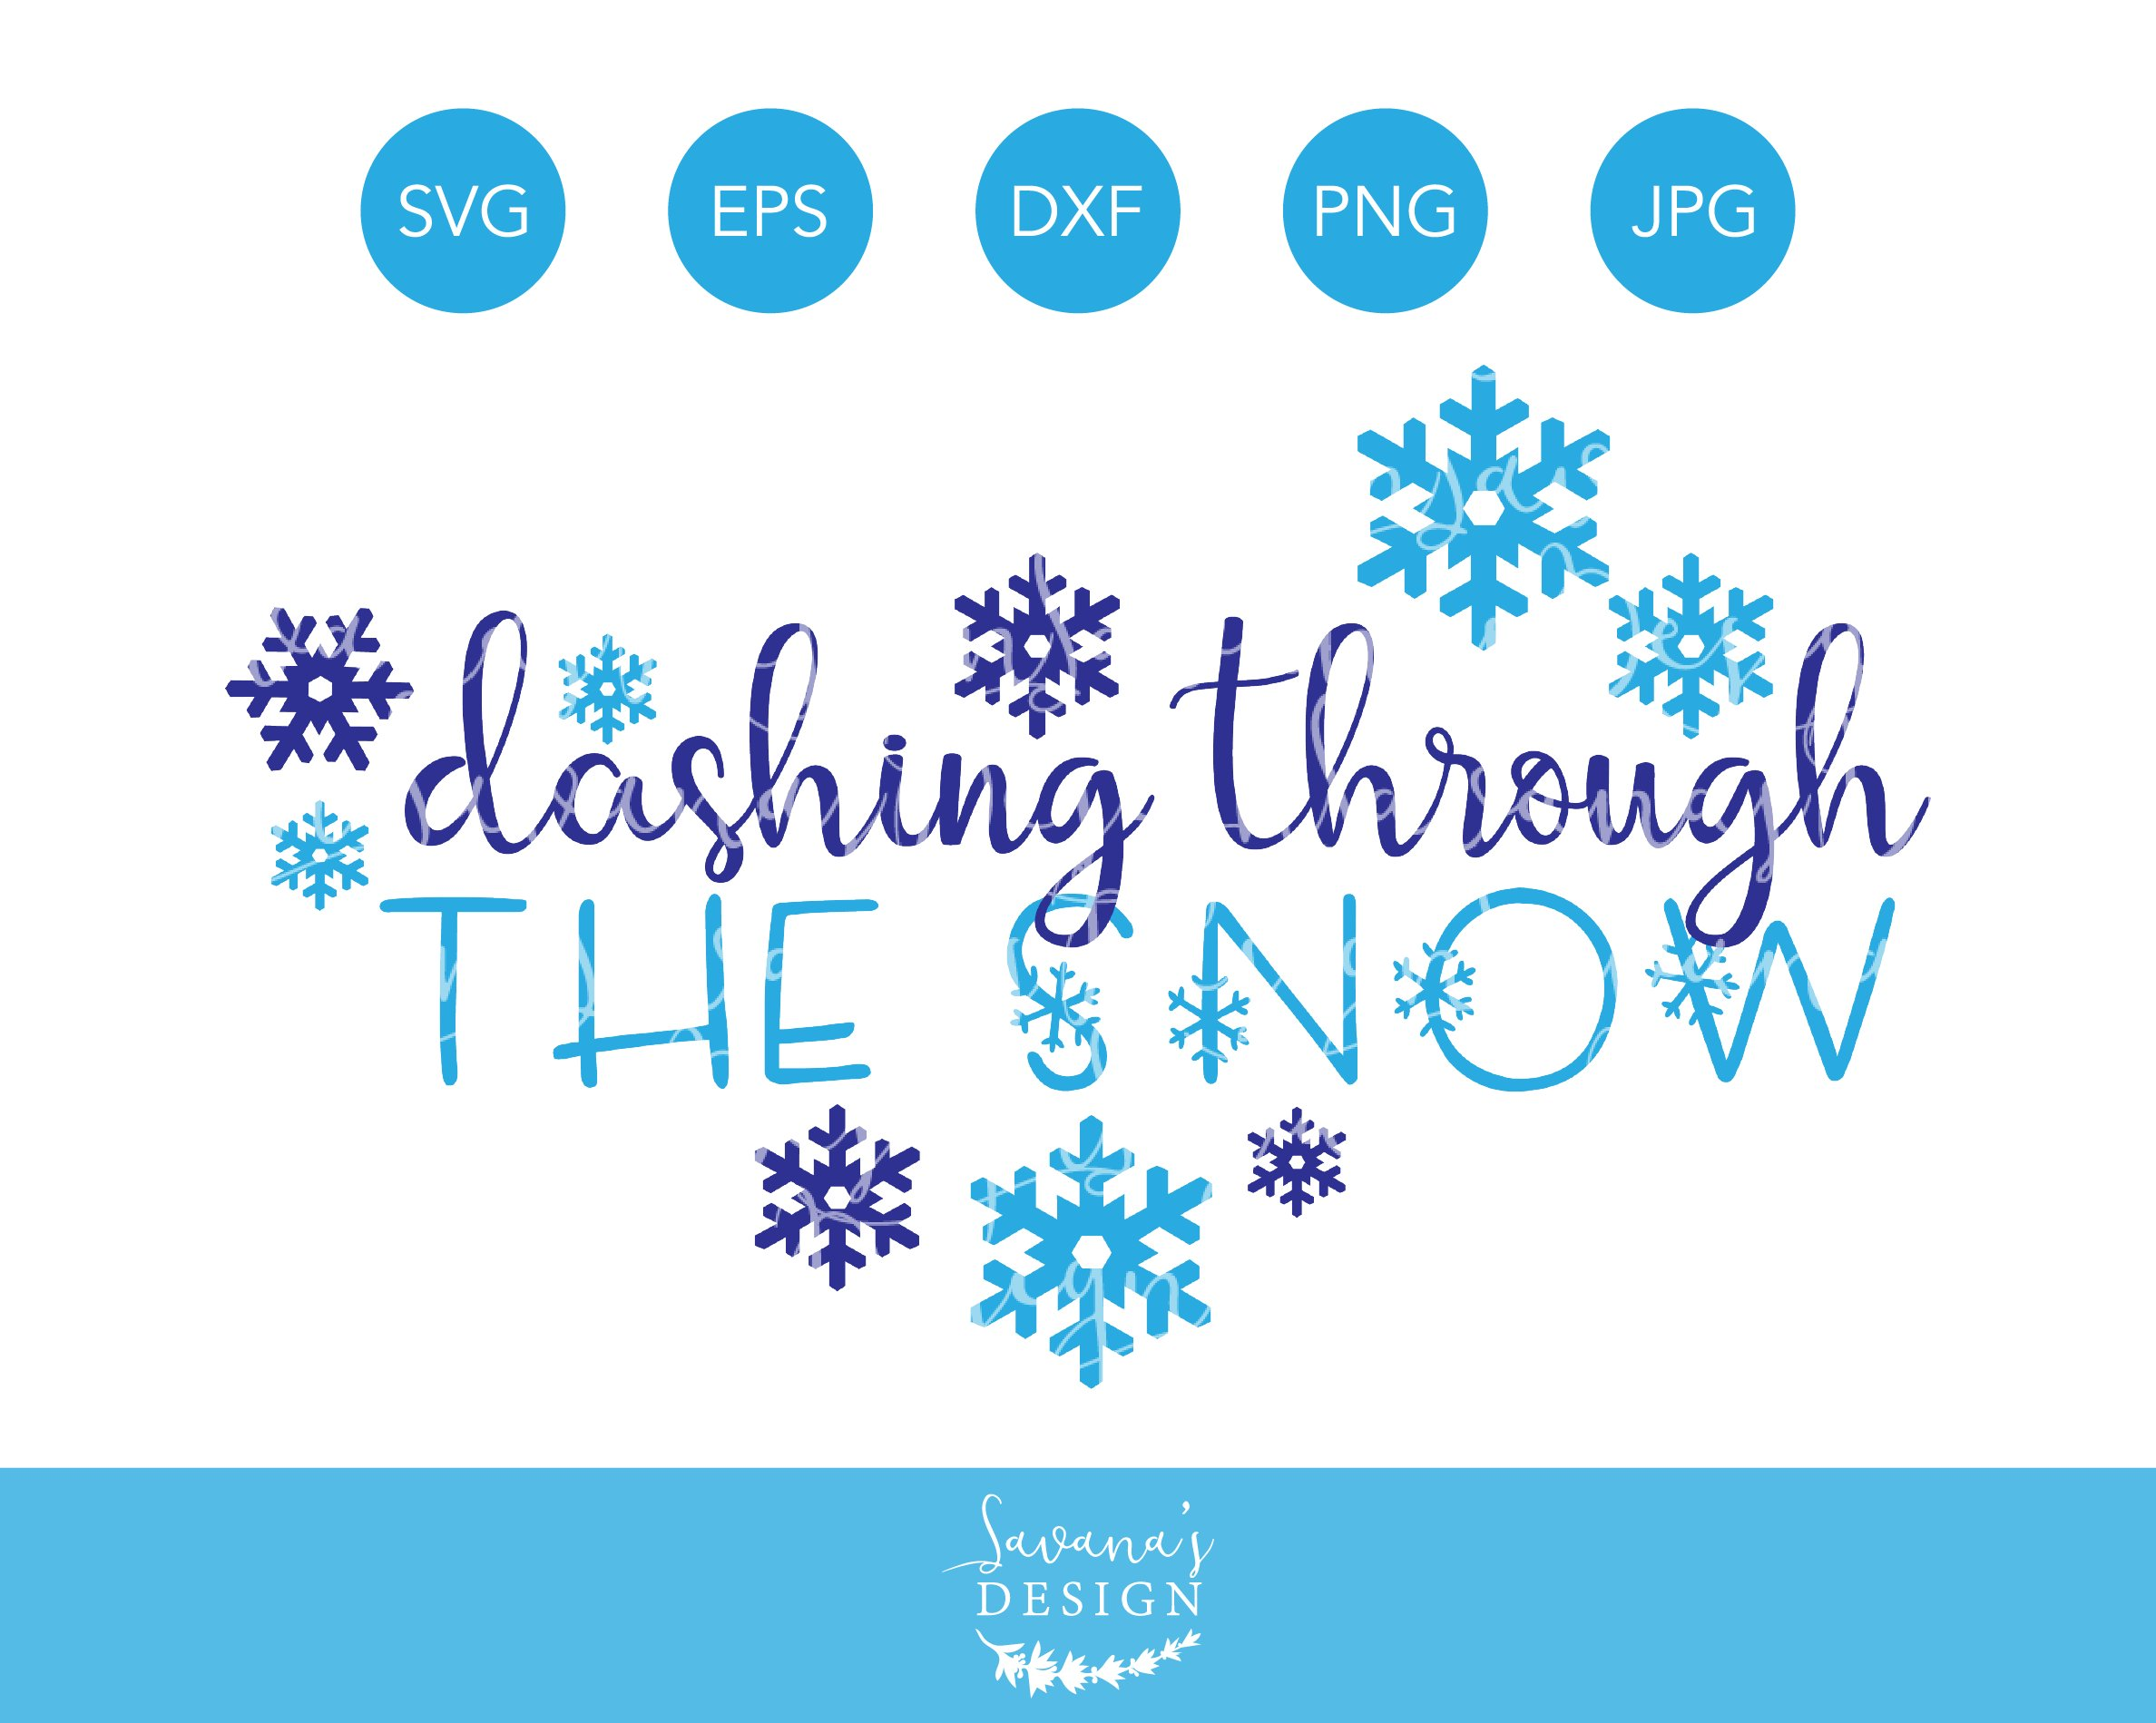 Dashing Through The Snow Svg Winter Pre Designed Illustrator Graphics Creative Market